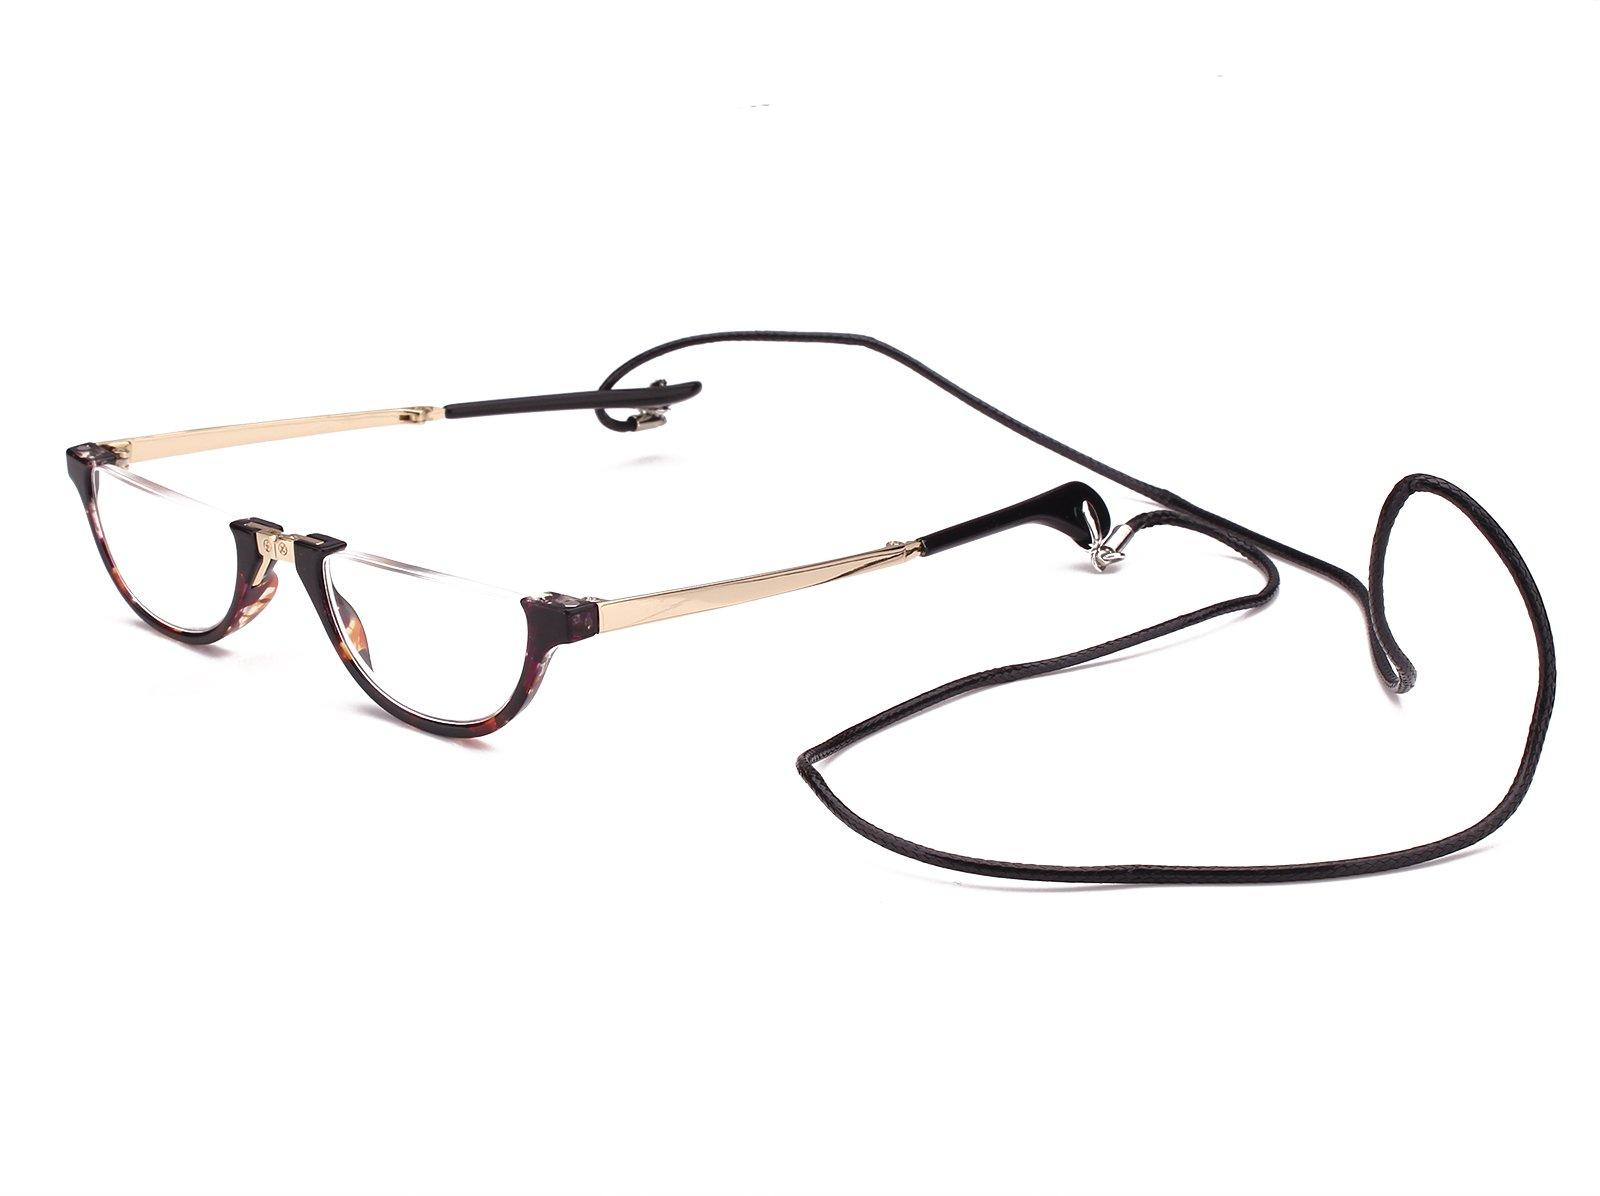 Agstum Mens Womens Half Moon Foldable Reading Glasses with Case (Tortoise shell, 1.5)